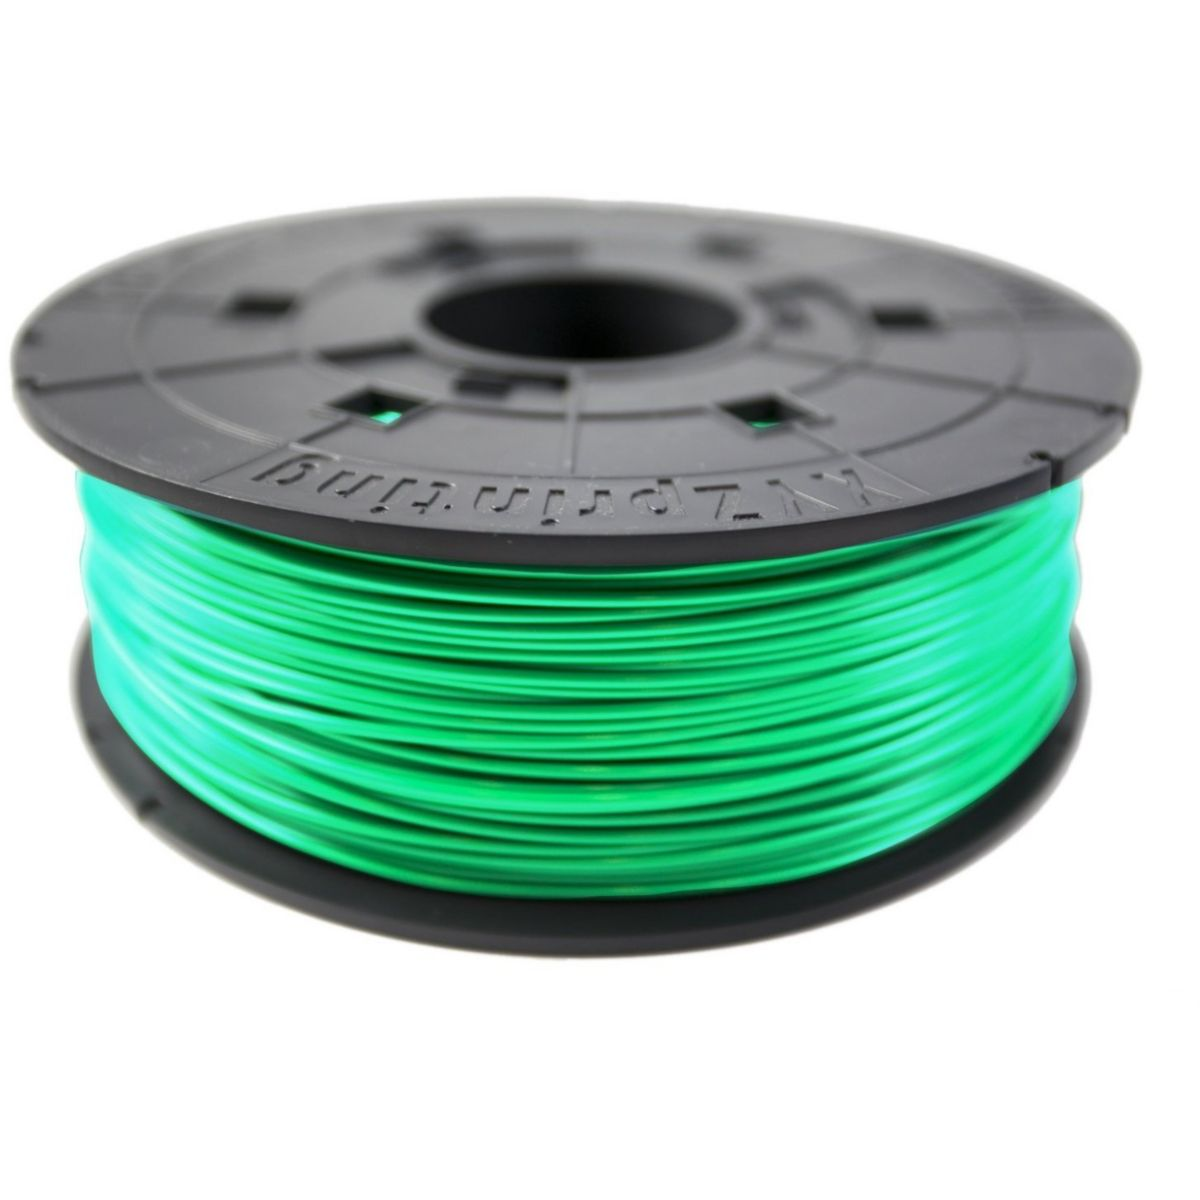 Cartouche XYZ PRINTING Bobine recharge ABS Vert clair